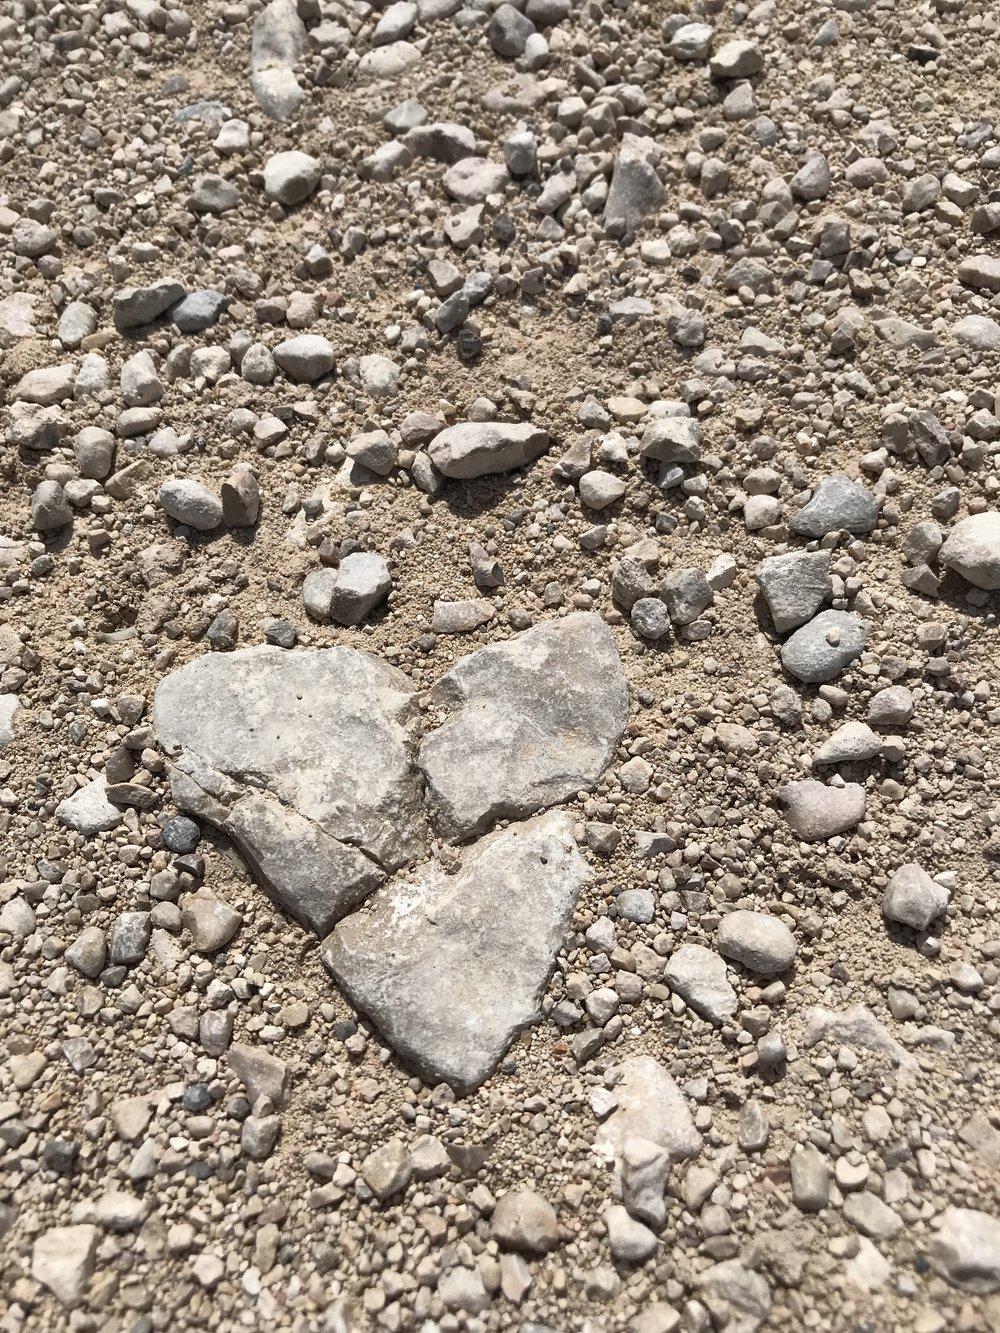 heart rock texas 1st stop.JPG